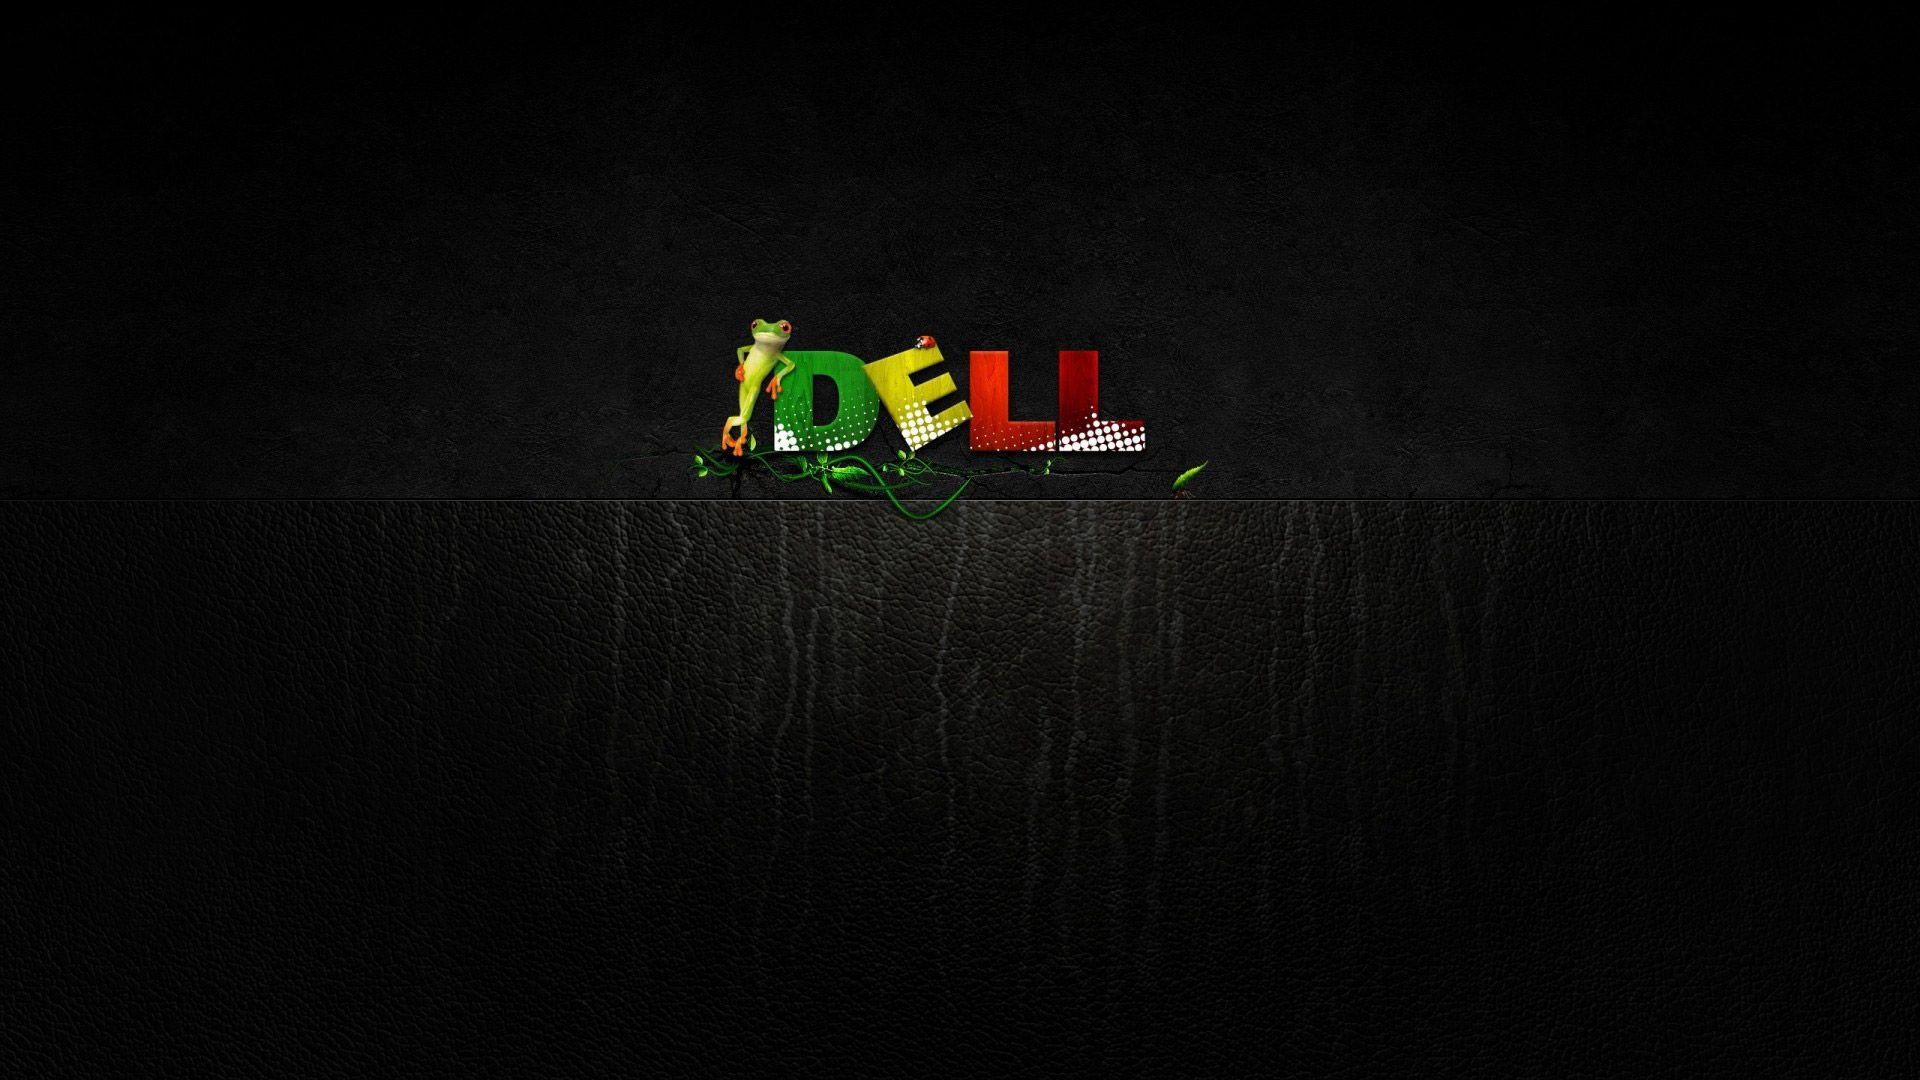 Dell Green Hd Wallpaper Fullhdwpp Full Hd Wallpapers 1920x1080 Dell Logo Wallpaper Companies Logo Wallpaper Hd